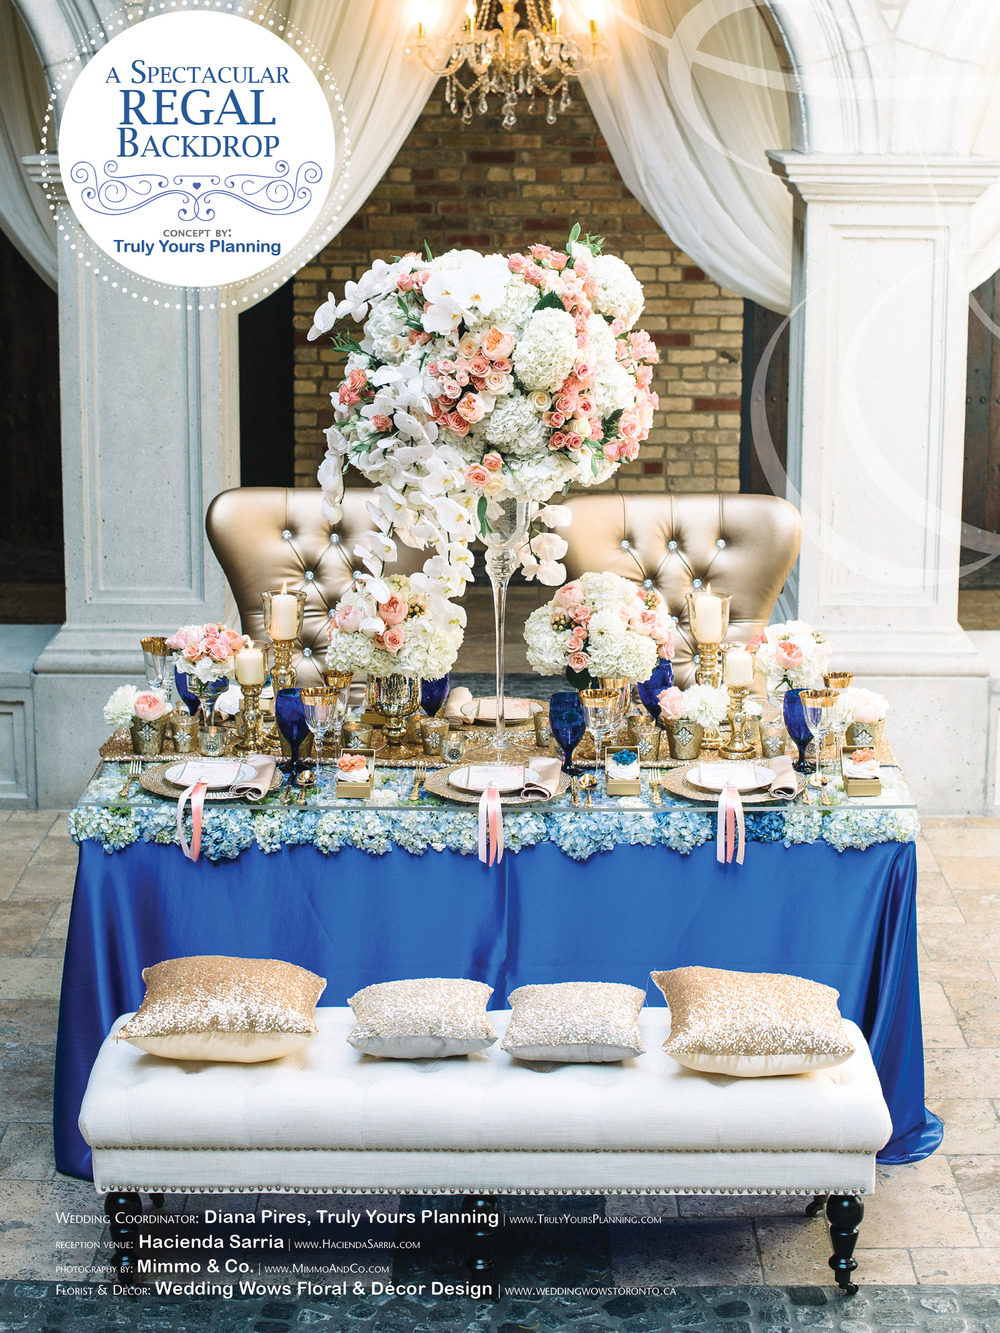 Photo by Mimmo & Co., Truly Yours Planning, Venue: Hacienda Sarria, Florist &Décor: Weddings Wows Floral &Décor Design, Chairs: Detailz, Flatware/Glassware: Chairman Mills, Chandeliers: Crystal.Cobalt blue satin